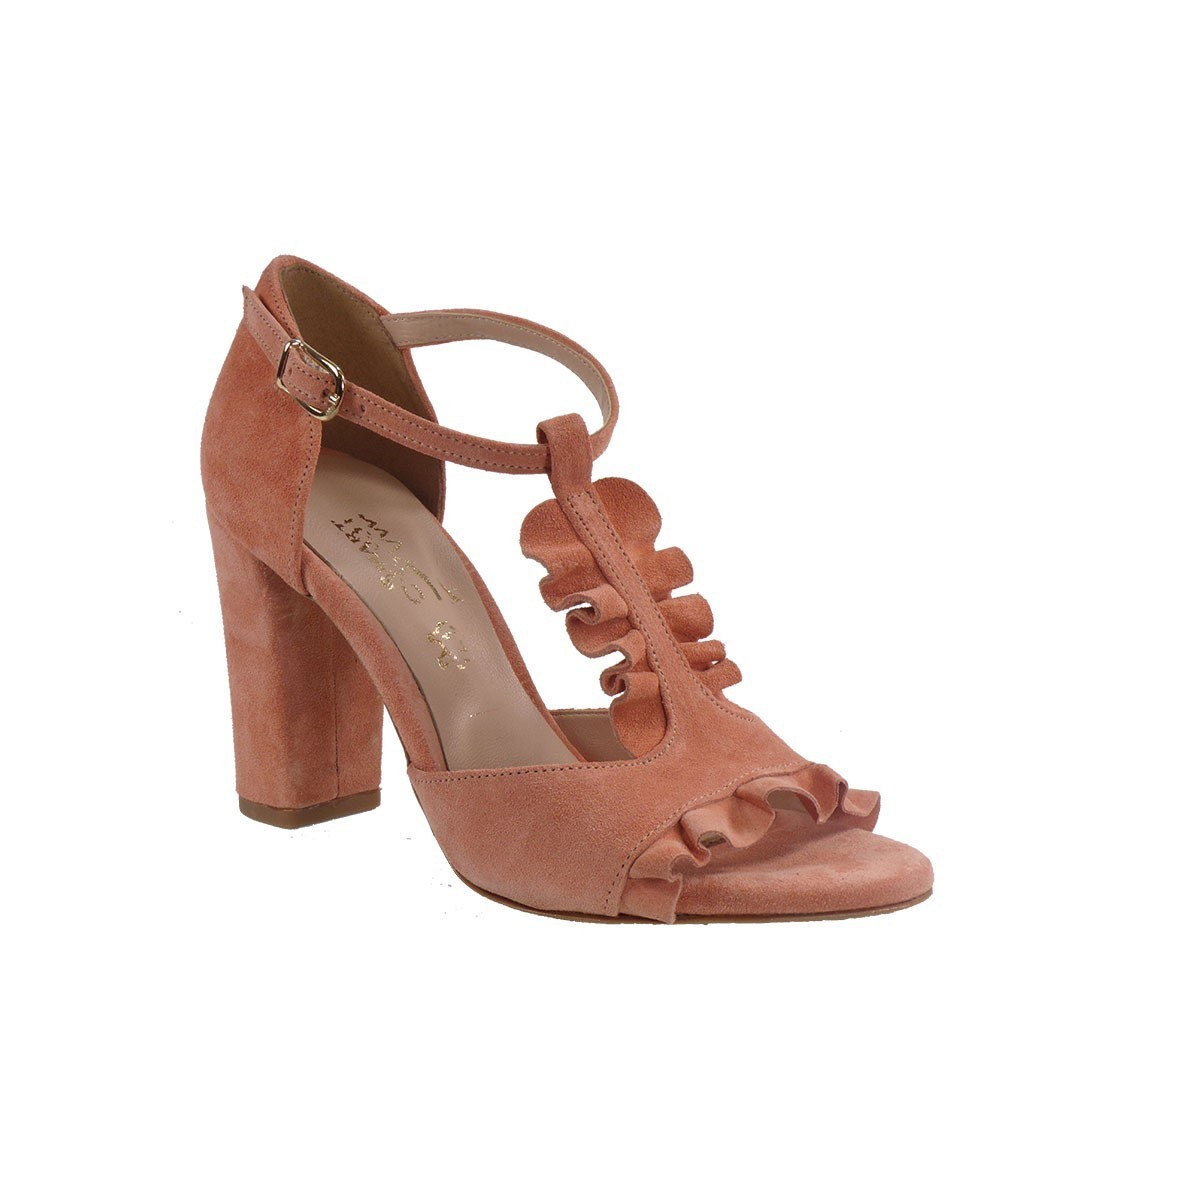 Smart Cronos Γυναικεία Παπούτσια Πέδιλα 6817-544 Βερυκοκί Καστόρι Δέρμα